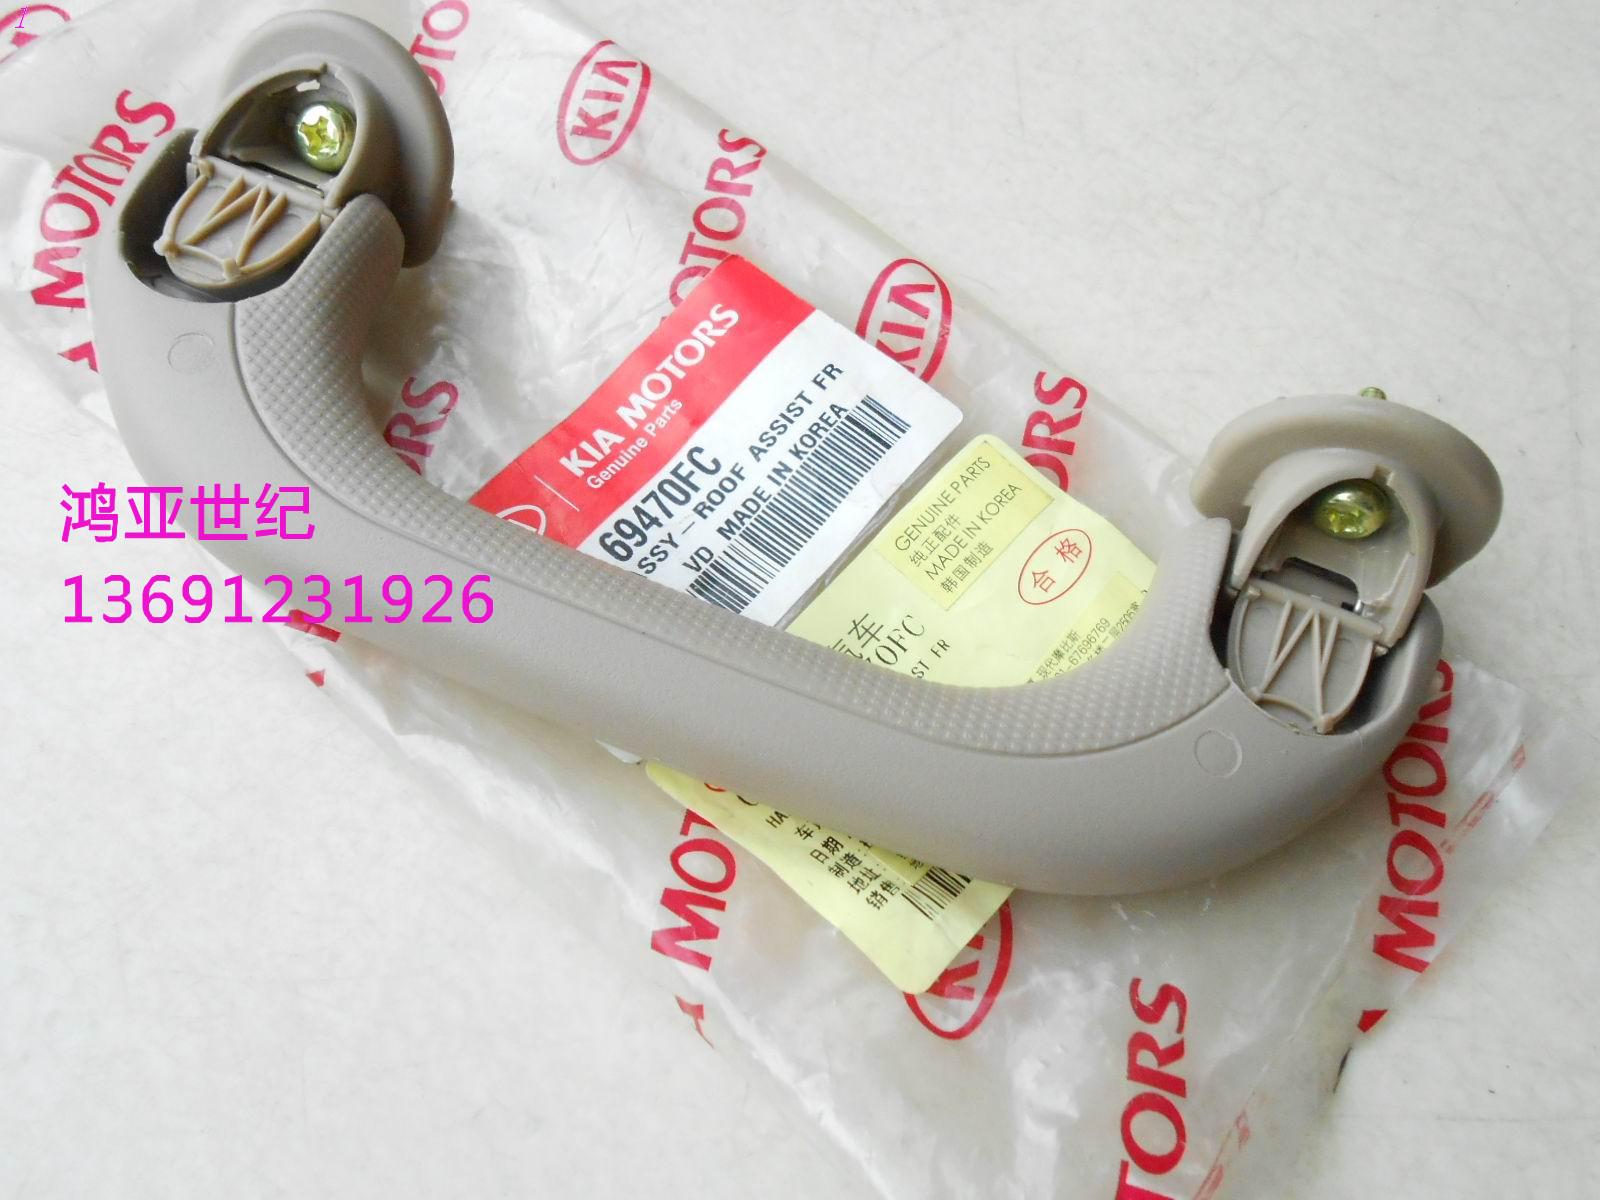 Kia jiale roof armrest roof handle original(China (Mainland))